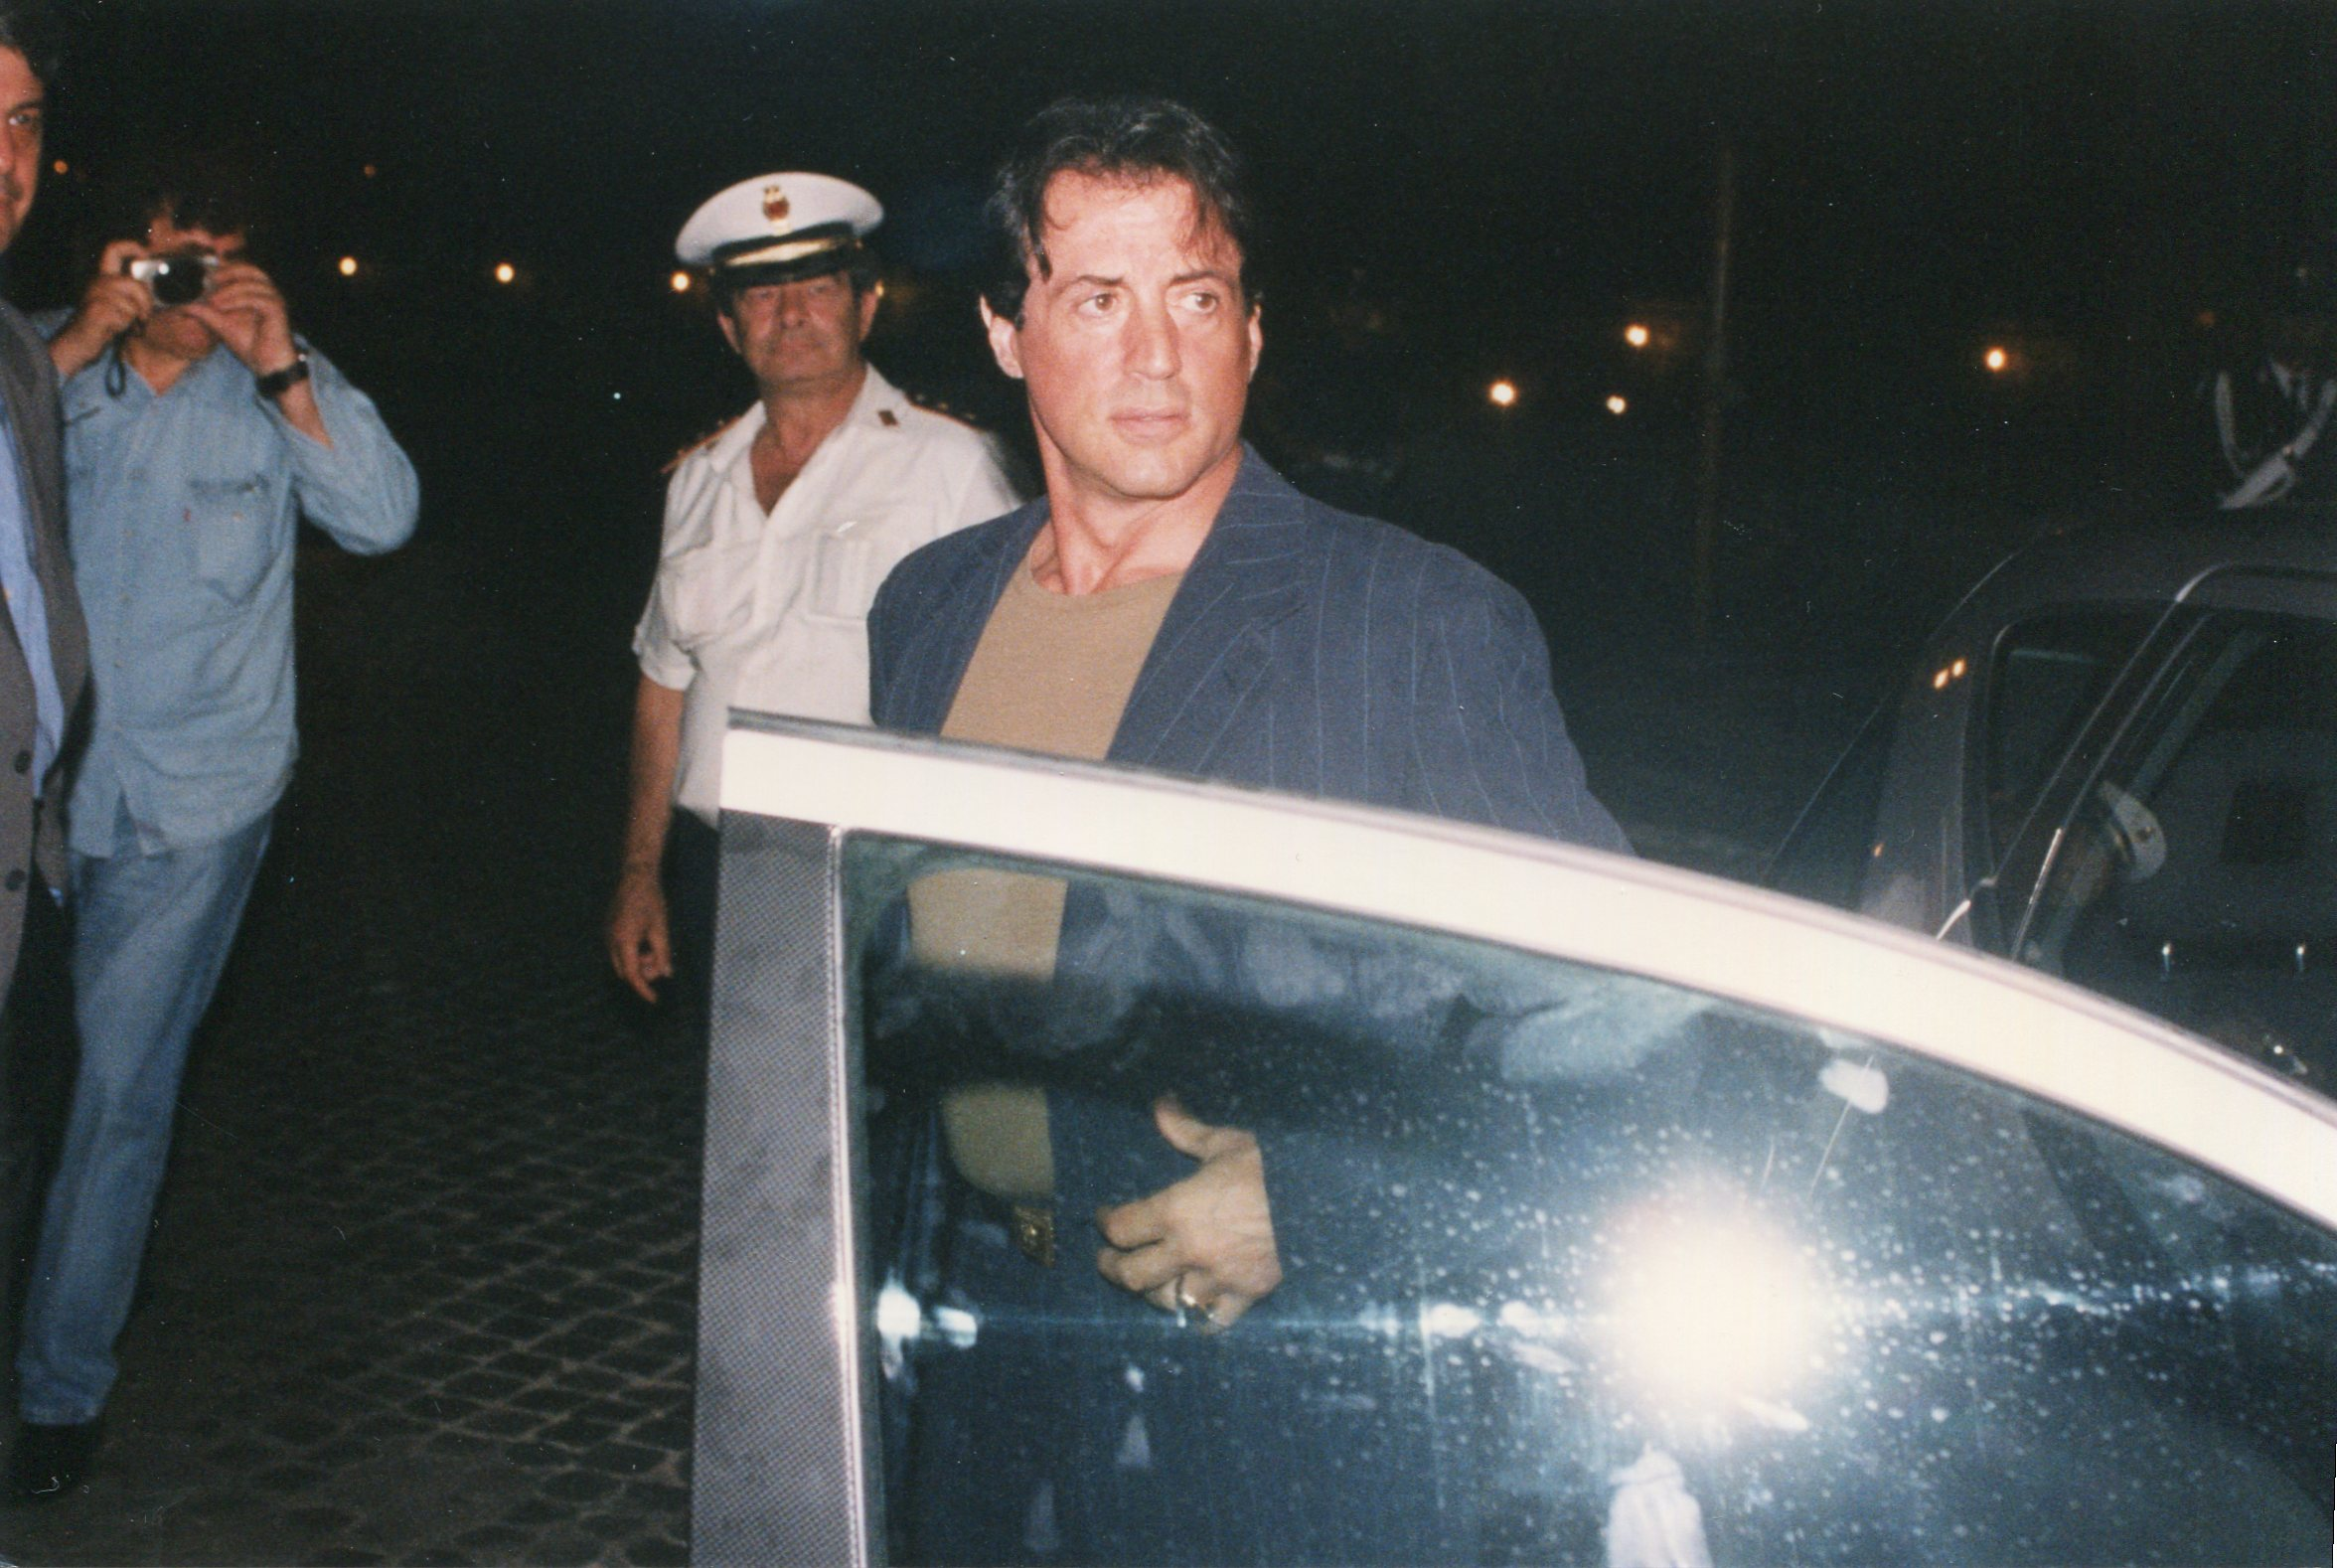 Sylvester Stallone in Gai Mattiolo